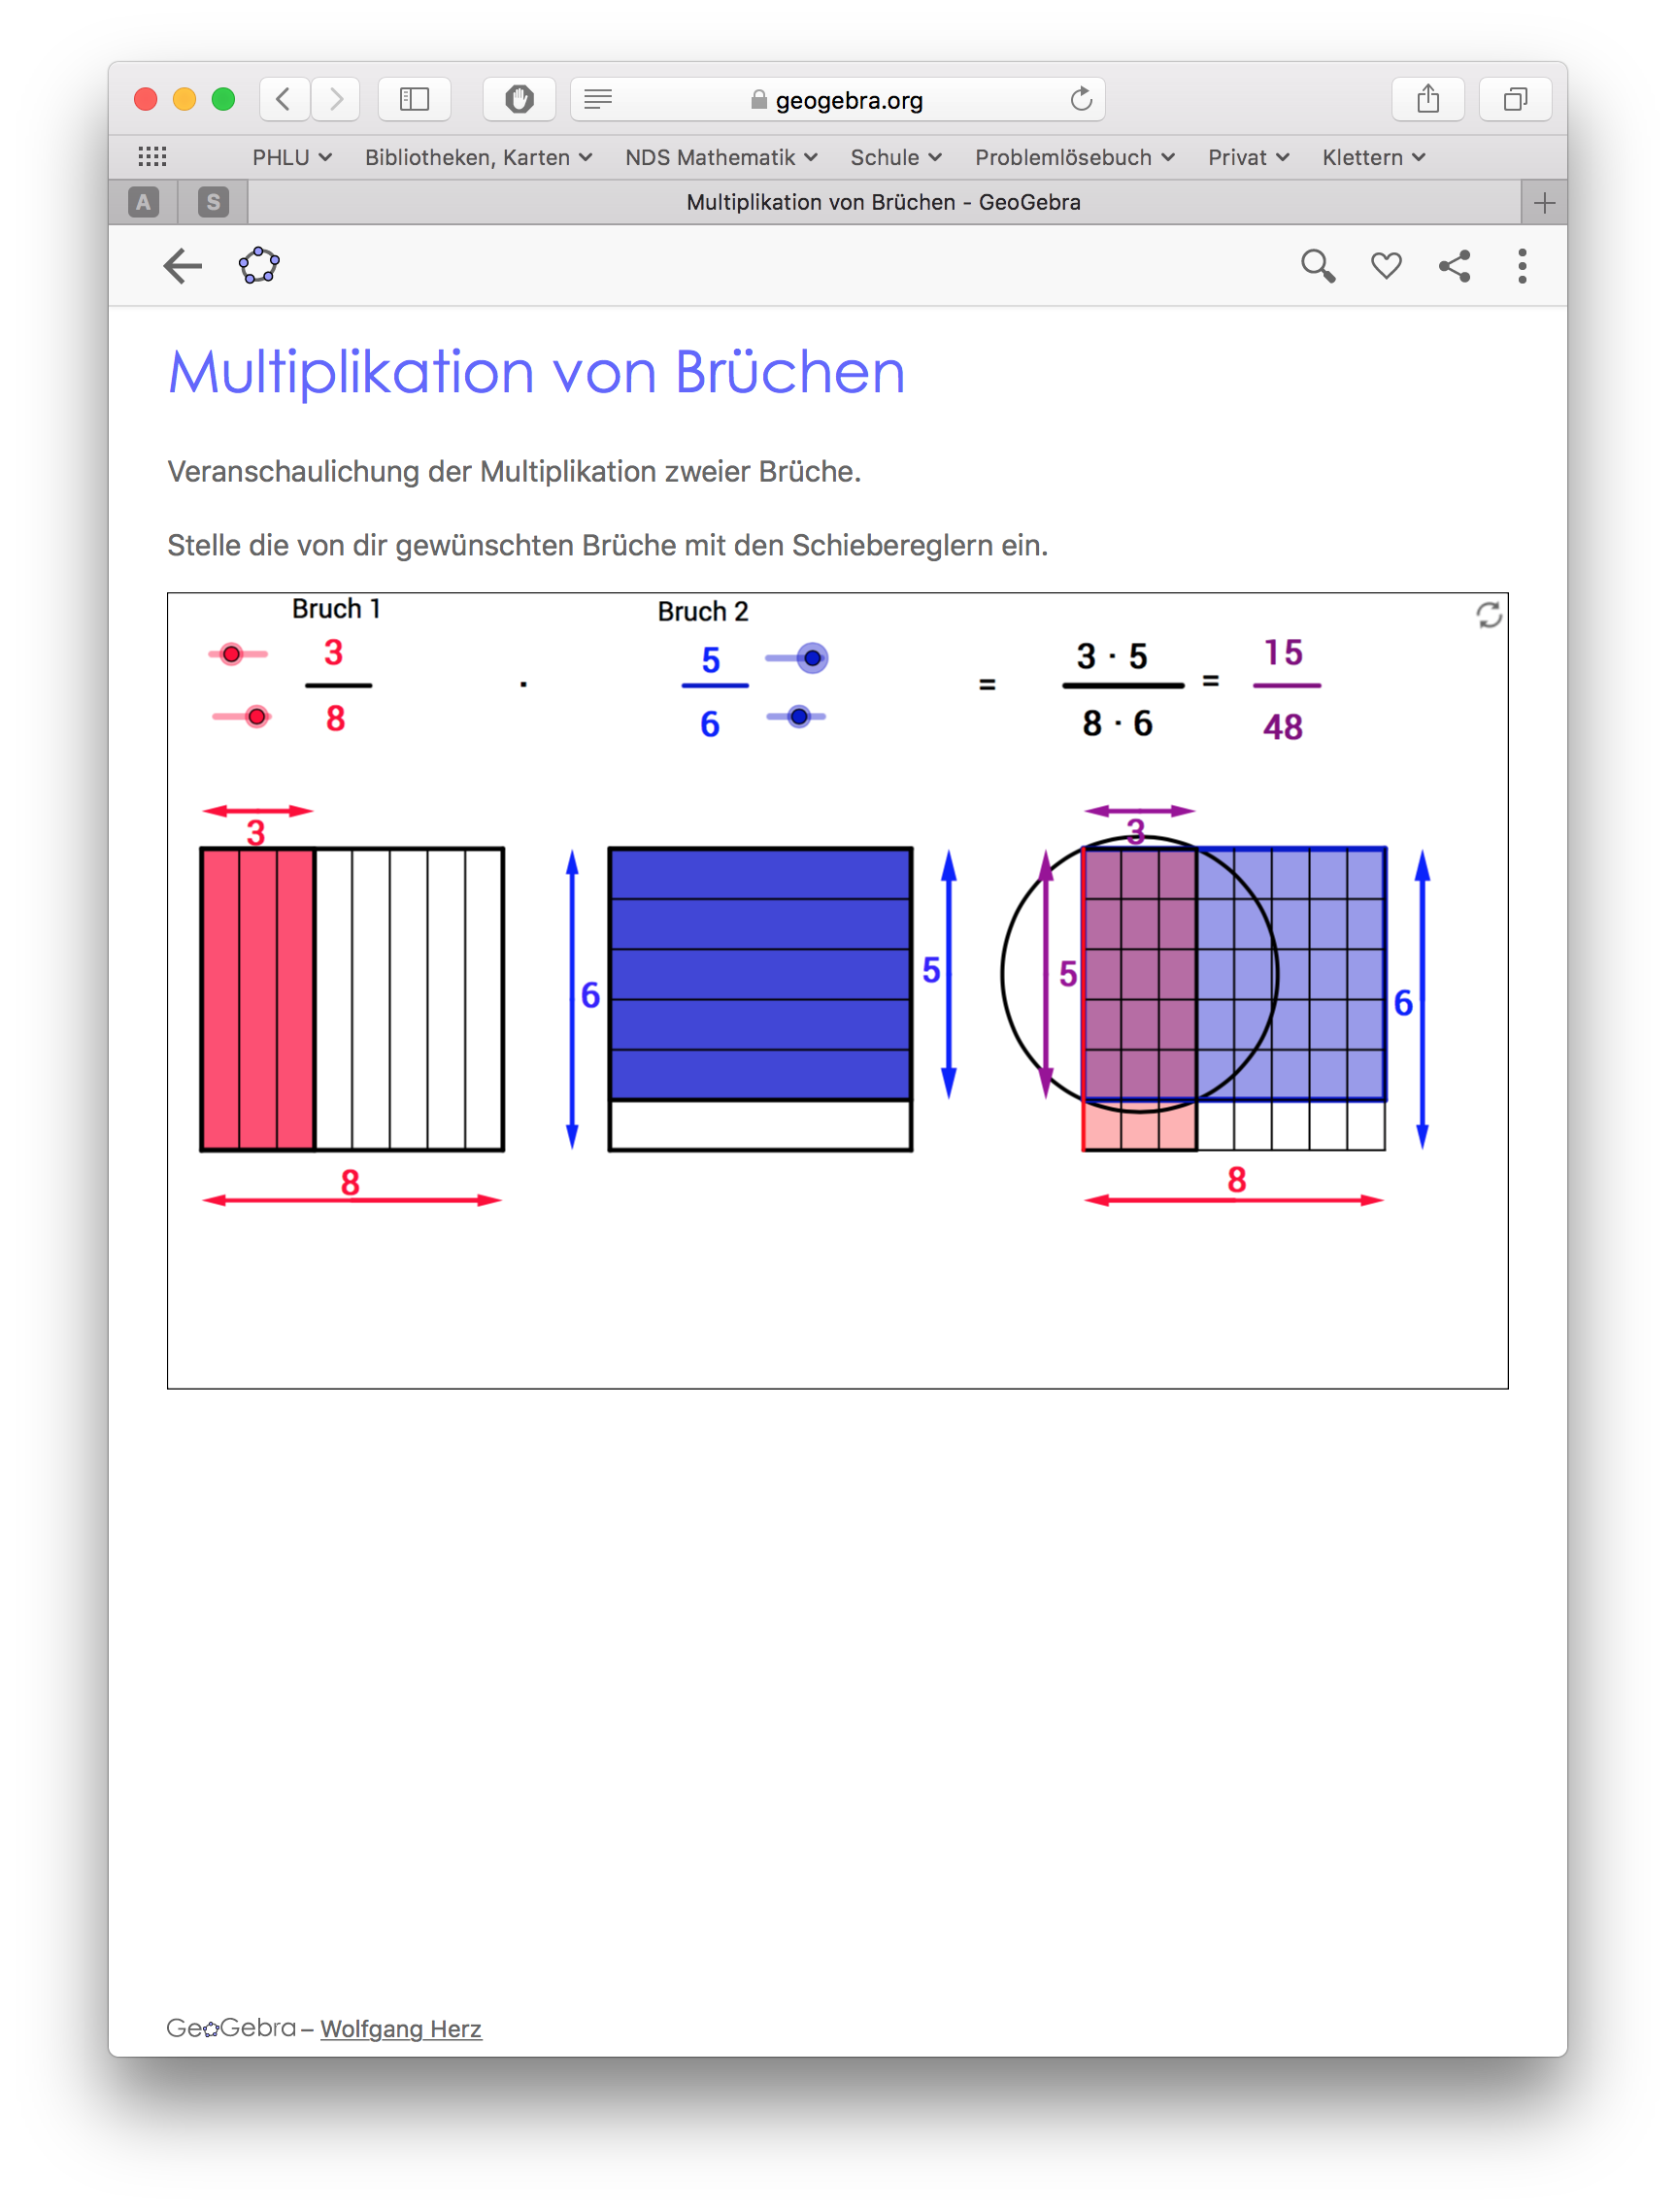 Preview image for LOM object Veranschaulichung der Bruchmultipikation mit Rechteckmodell in Geogebra